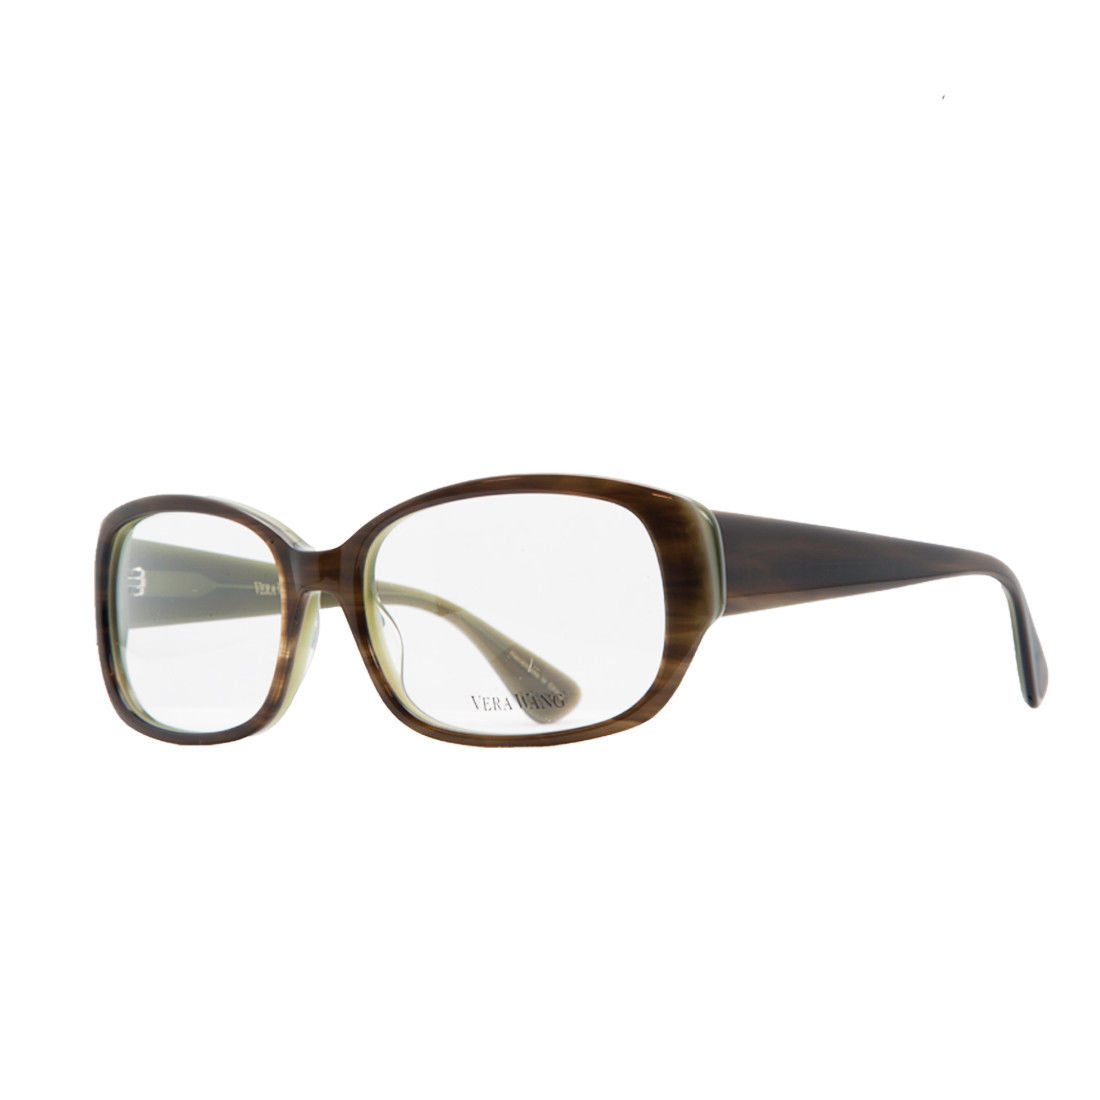 Vera Wang VE 04 MO 54 Moss/Tortoise Full Rim Womens Optical Frame